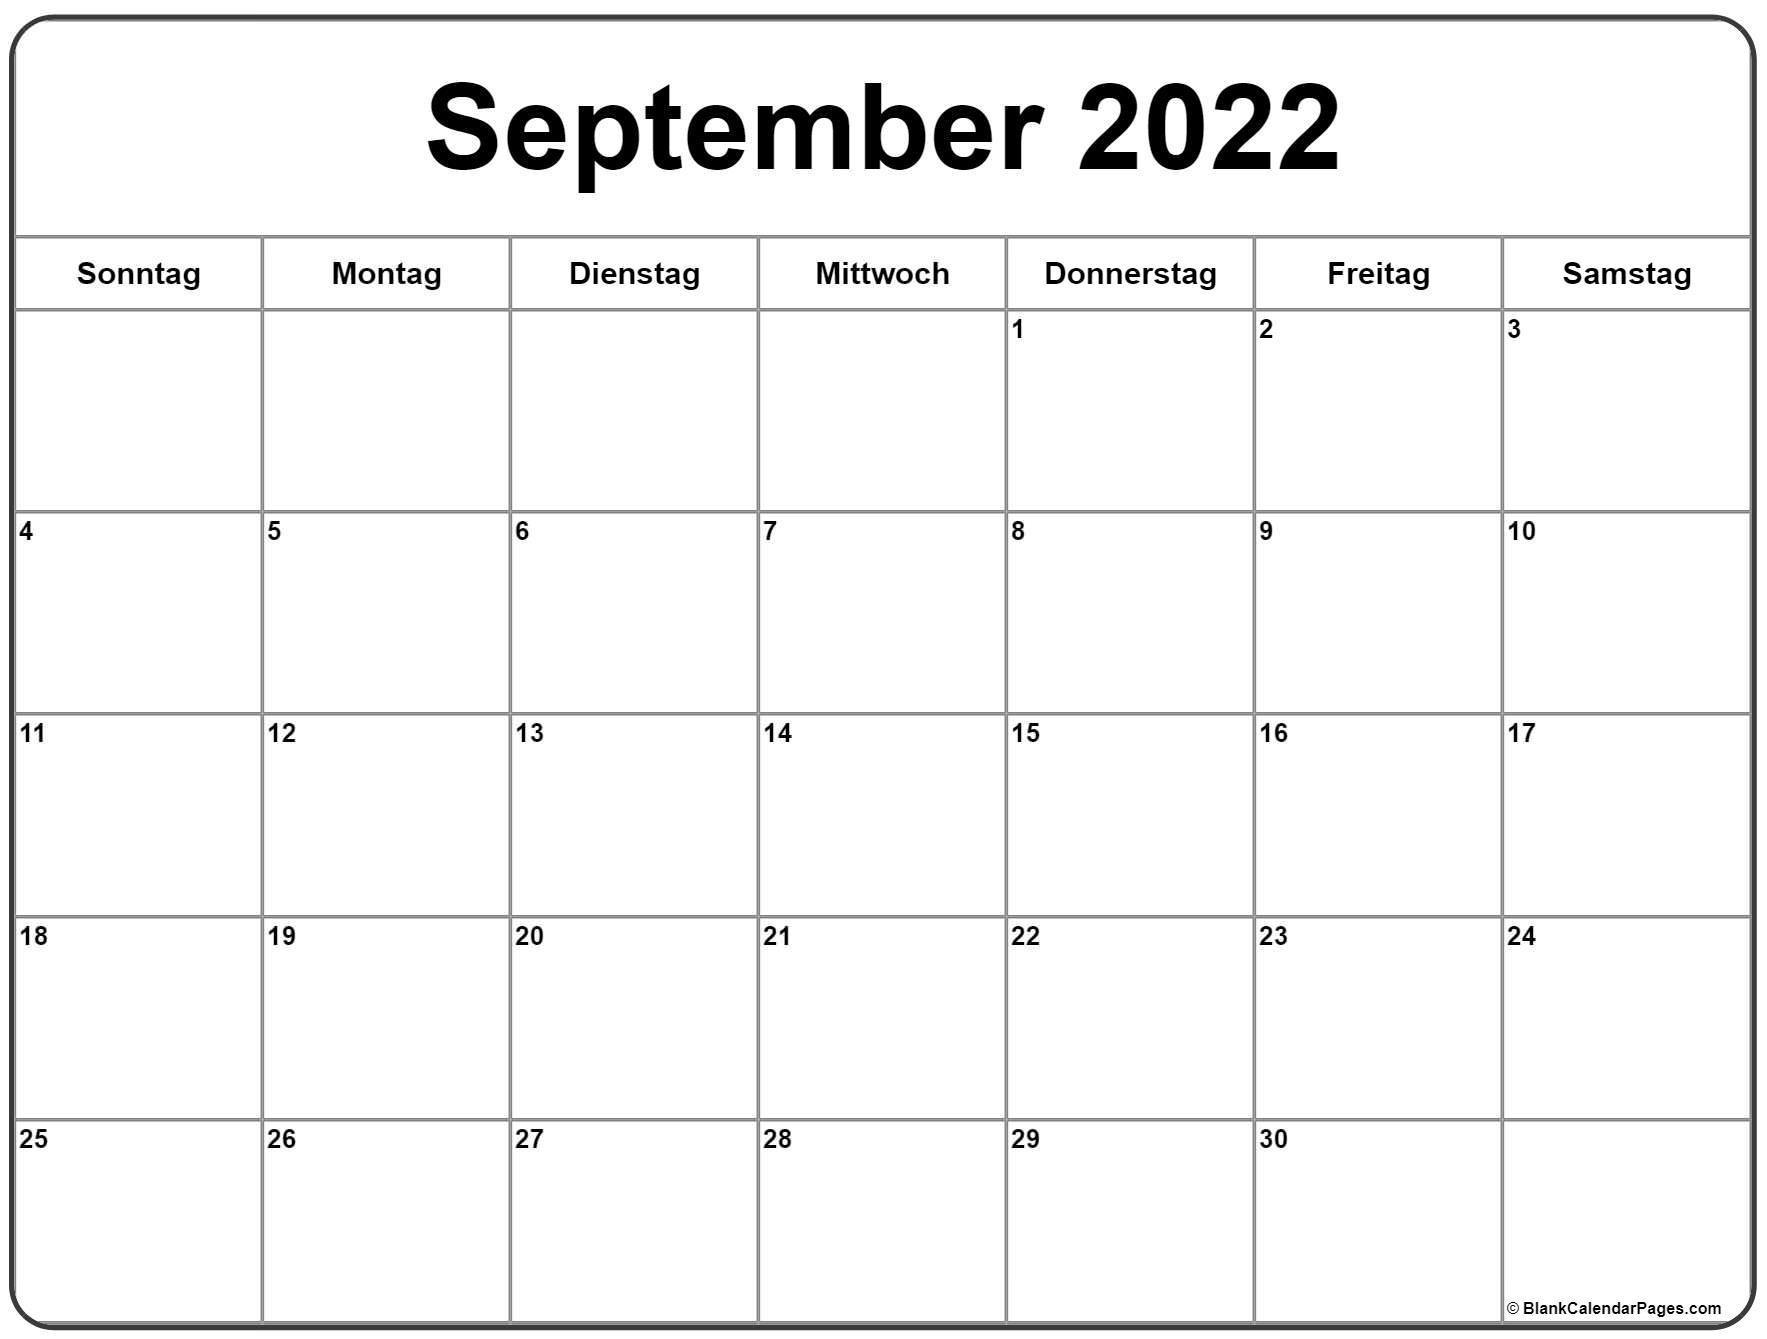 September 2022 Kalender | Kalender 2022 General Blue August 2021 Calendar